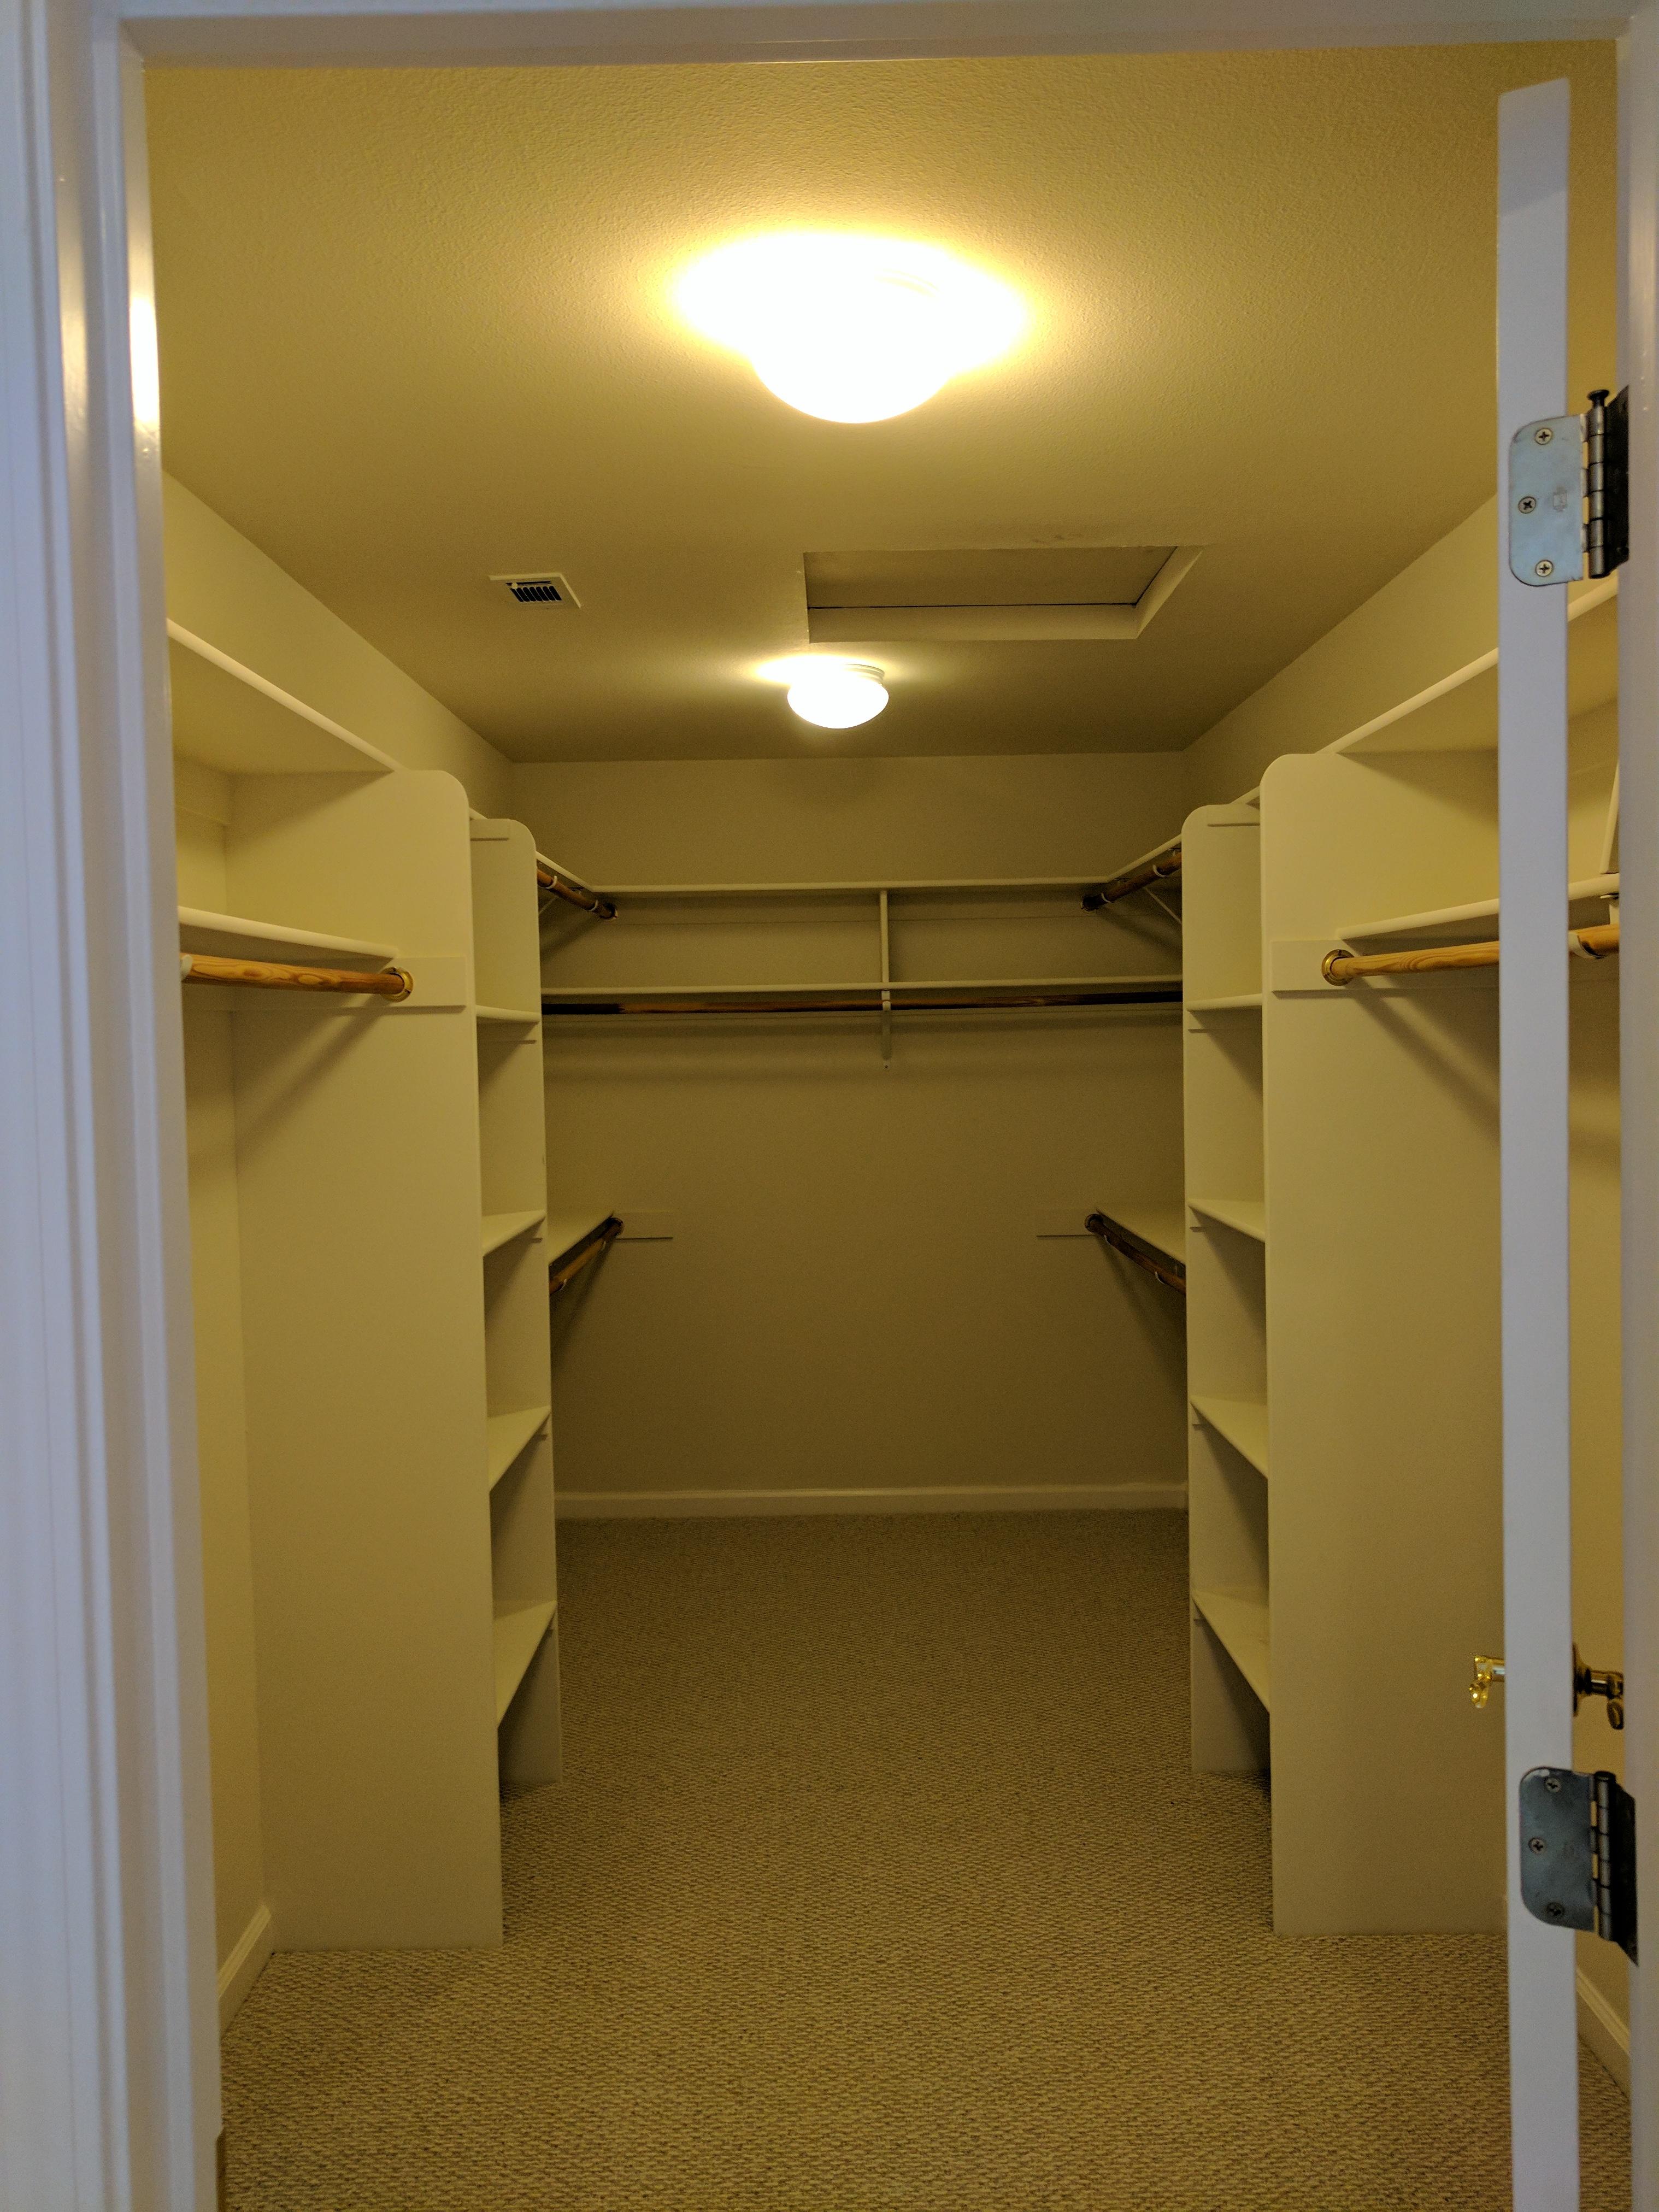 927 Oakes St East Palo Alto Rental Listings Avail